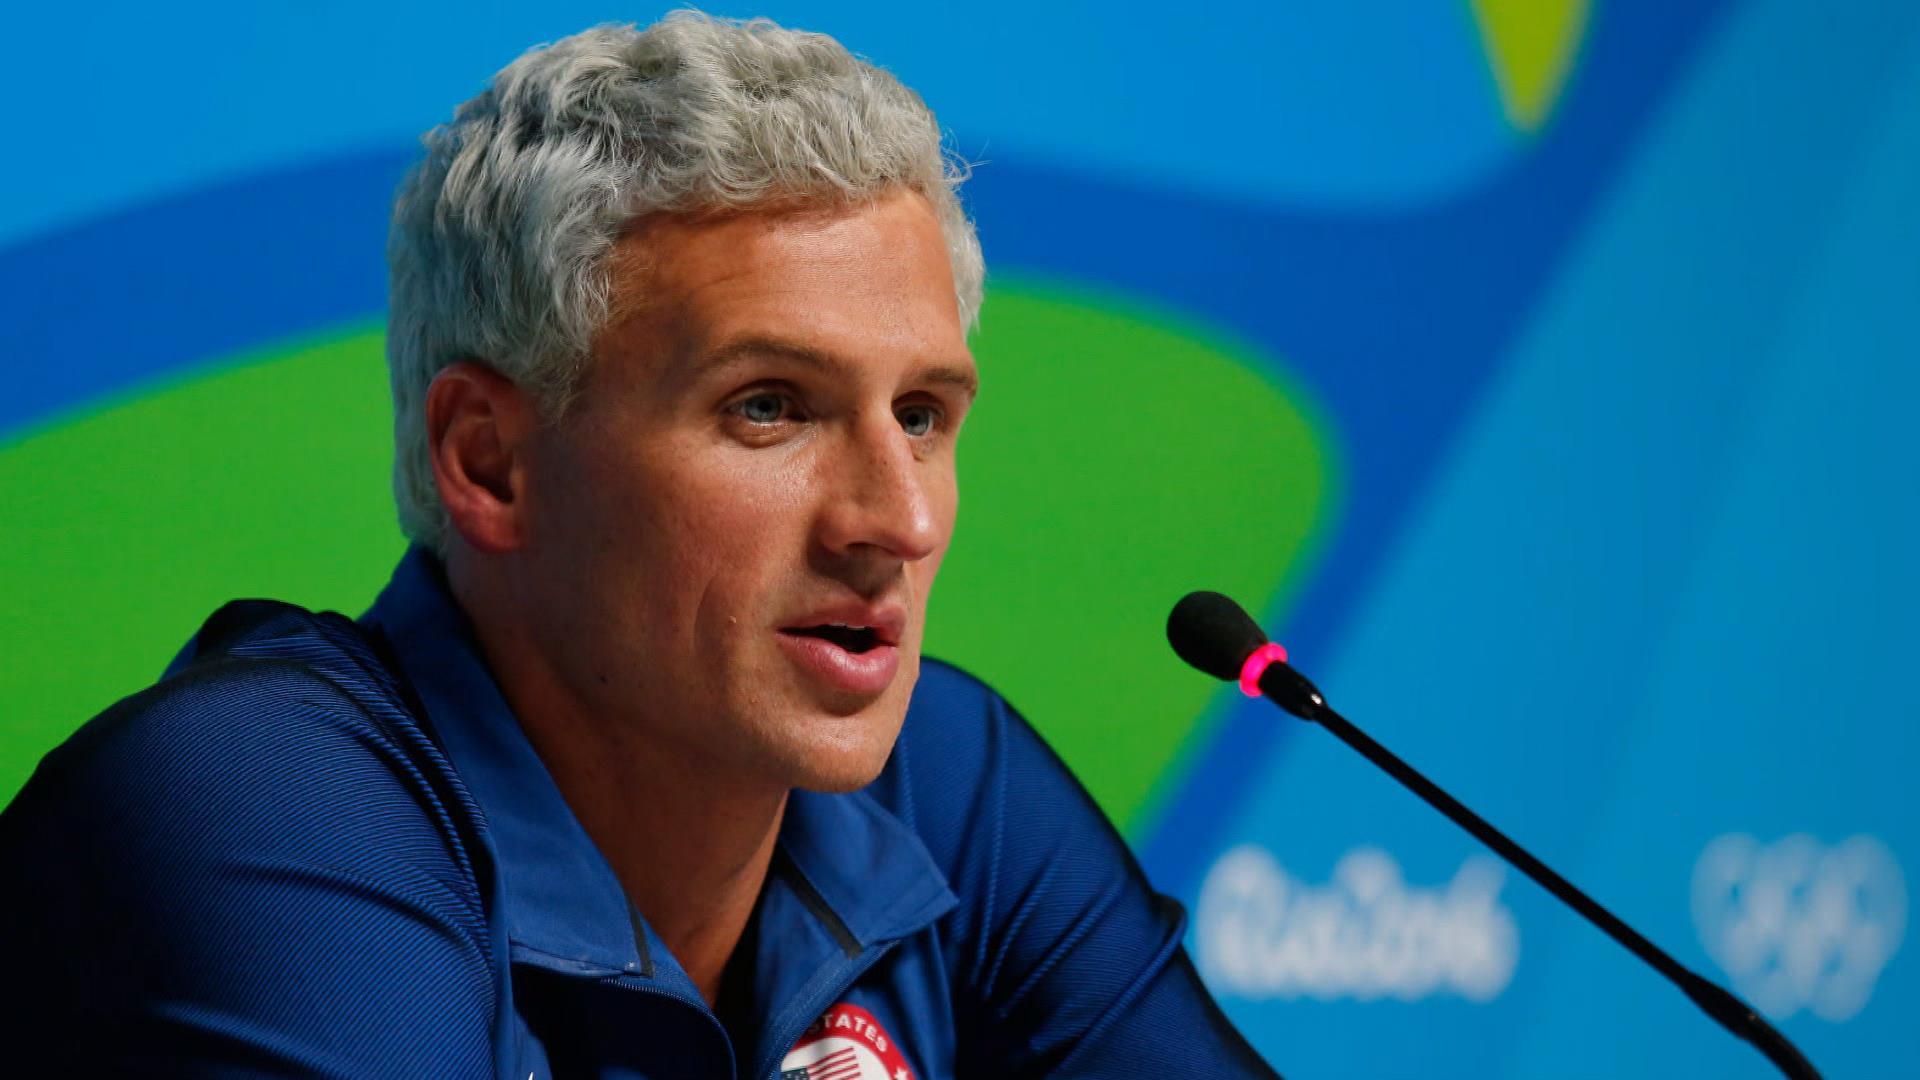 Ryan Lochte apologizes to teammates, Brazil in statement on Rio scandal